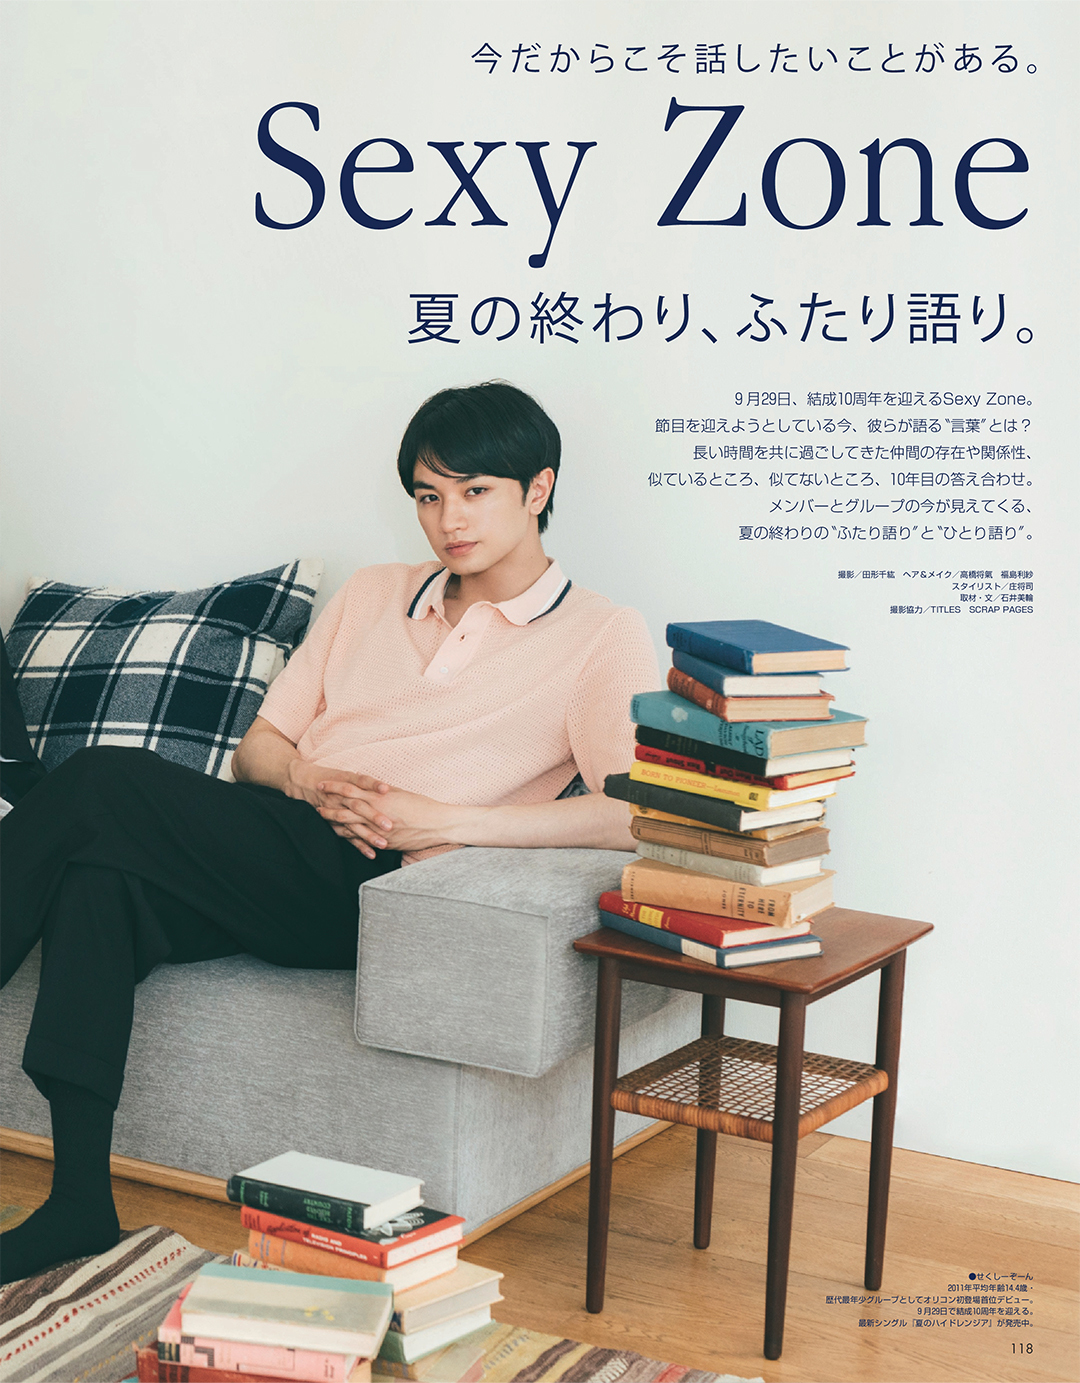 Sexy Zone 夏の終わり、ふたり語り。